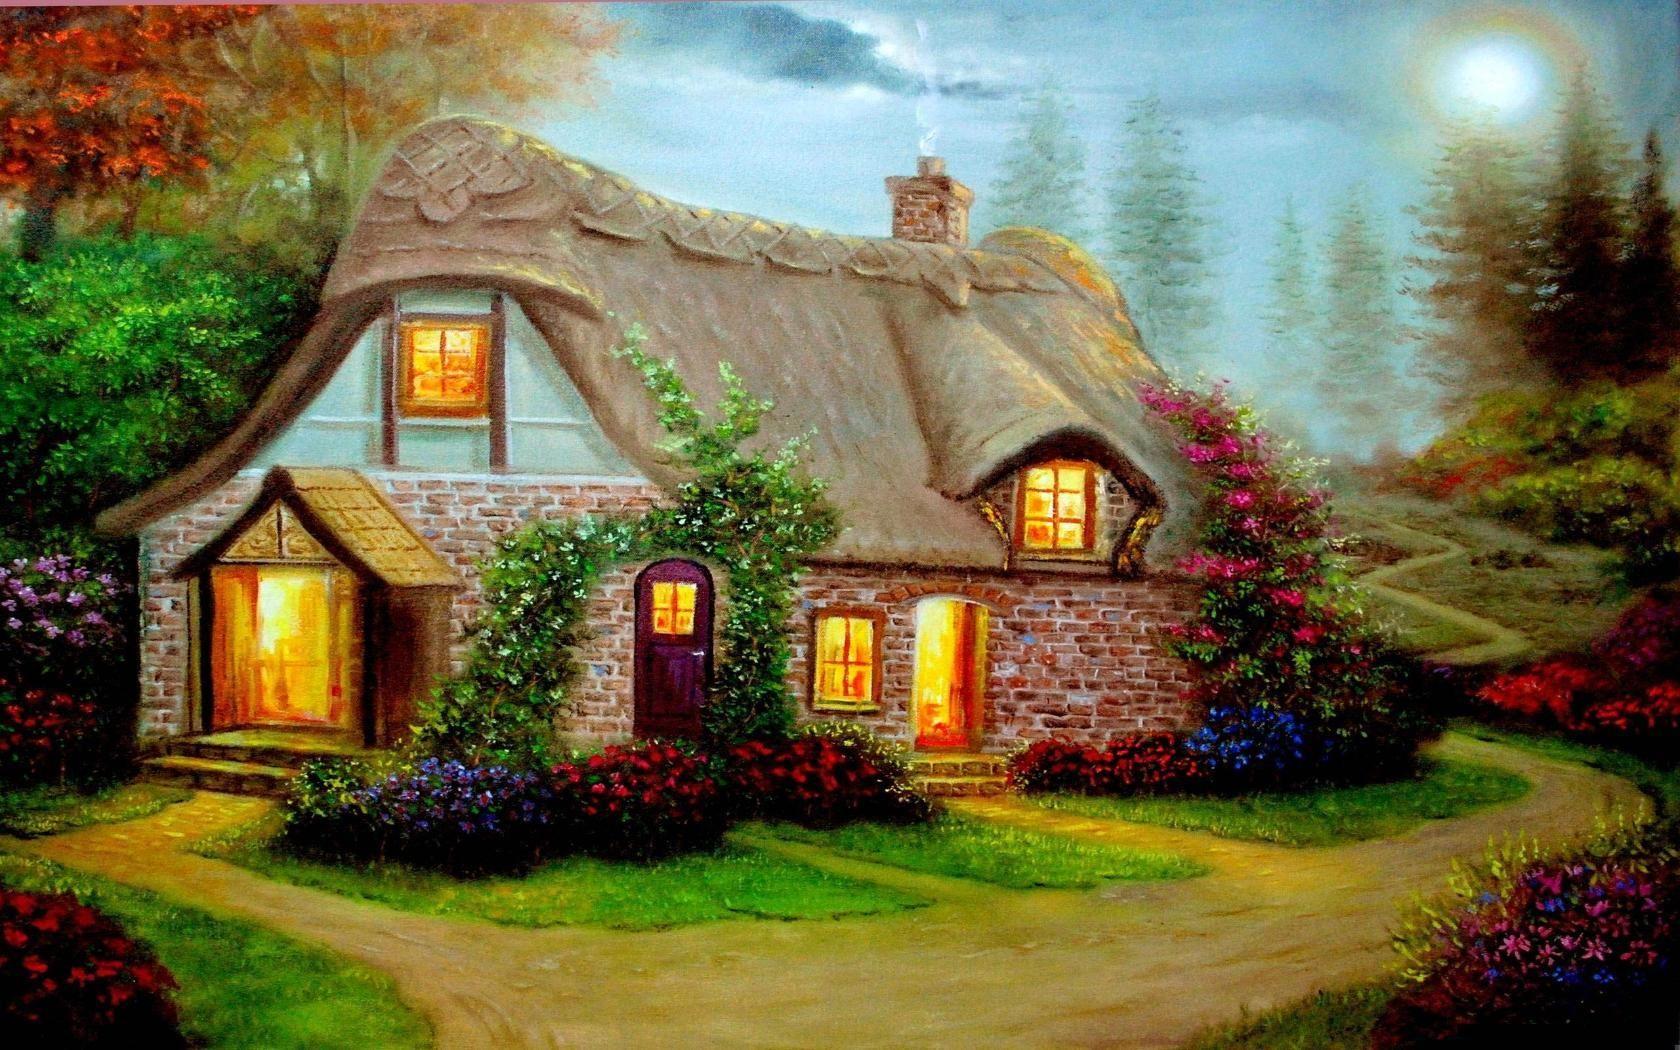 Картинка домика из сказки